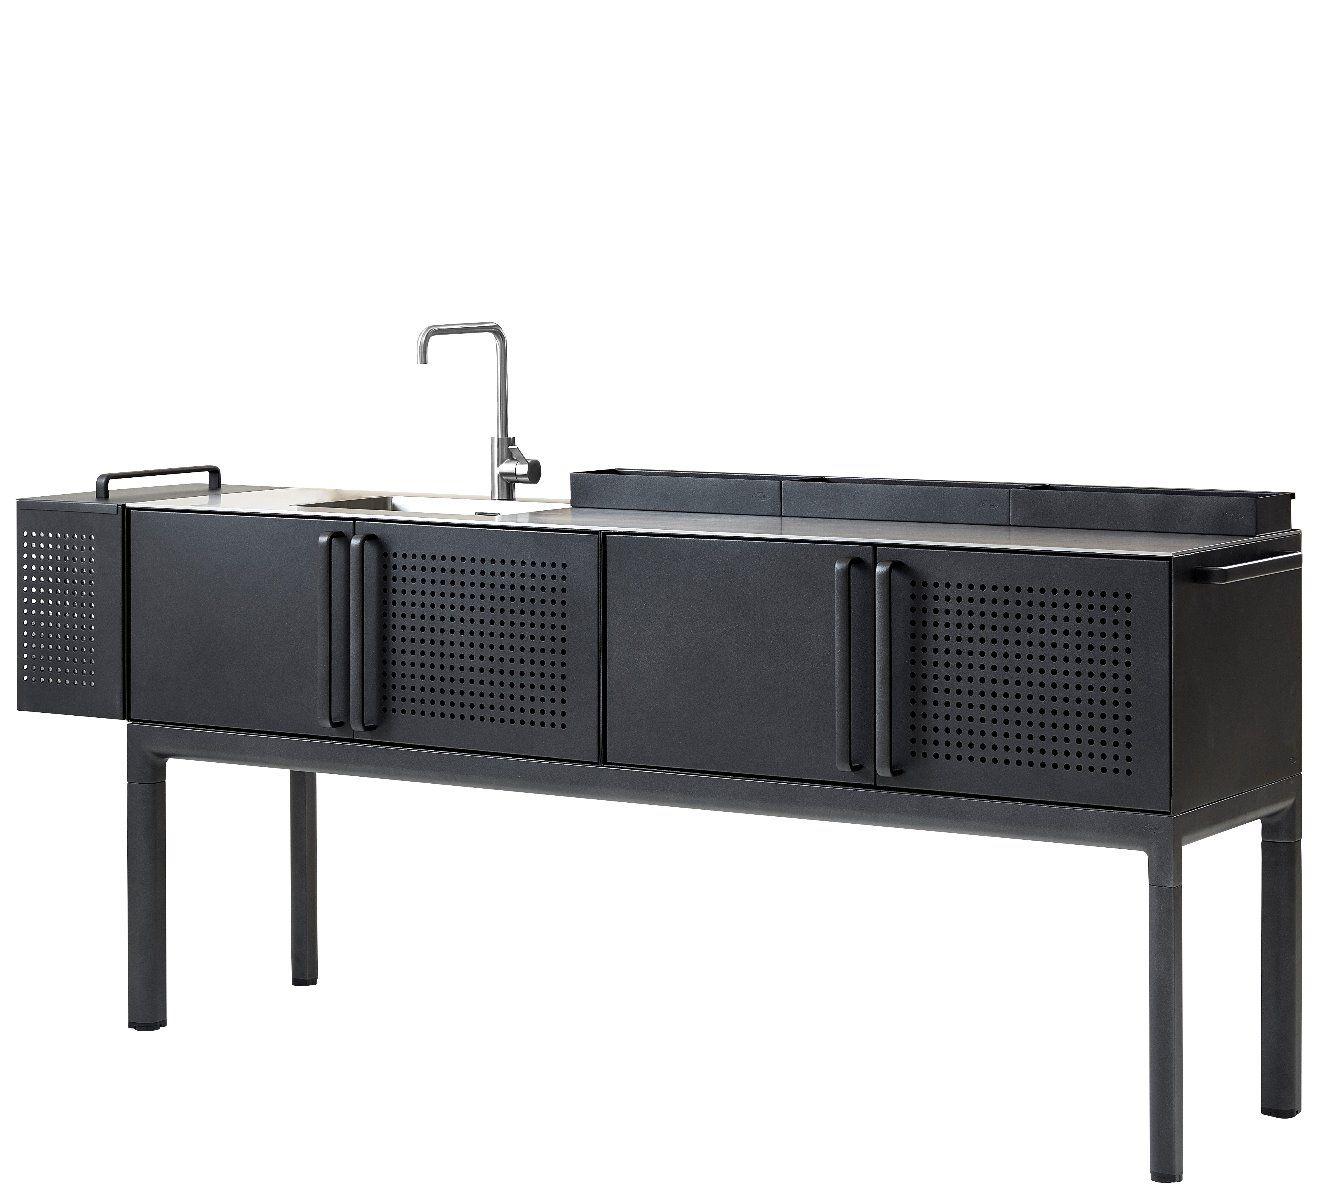 Full Size of Sideboard Küche Holz Anrichte Für Die Küche Anrichte Küche Weiß Hochglanz Anrichte Küche Ikea Küche Anrichte Küche